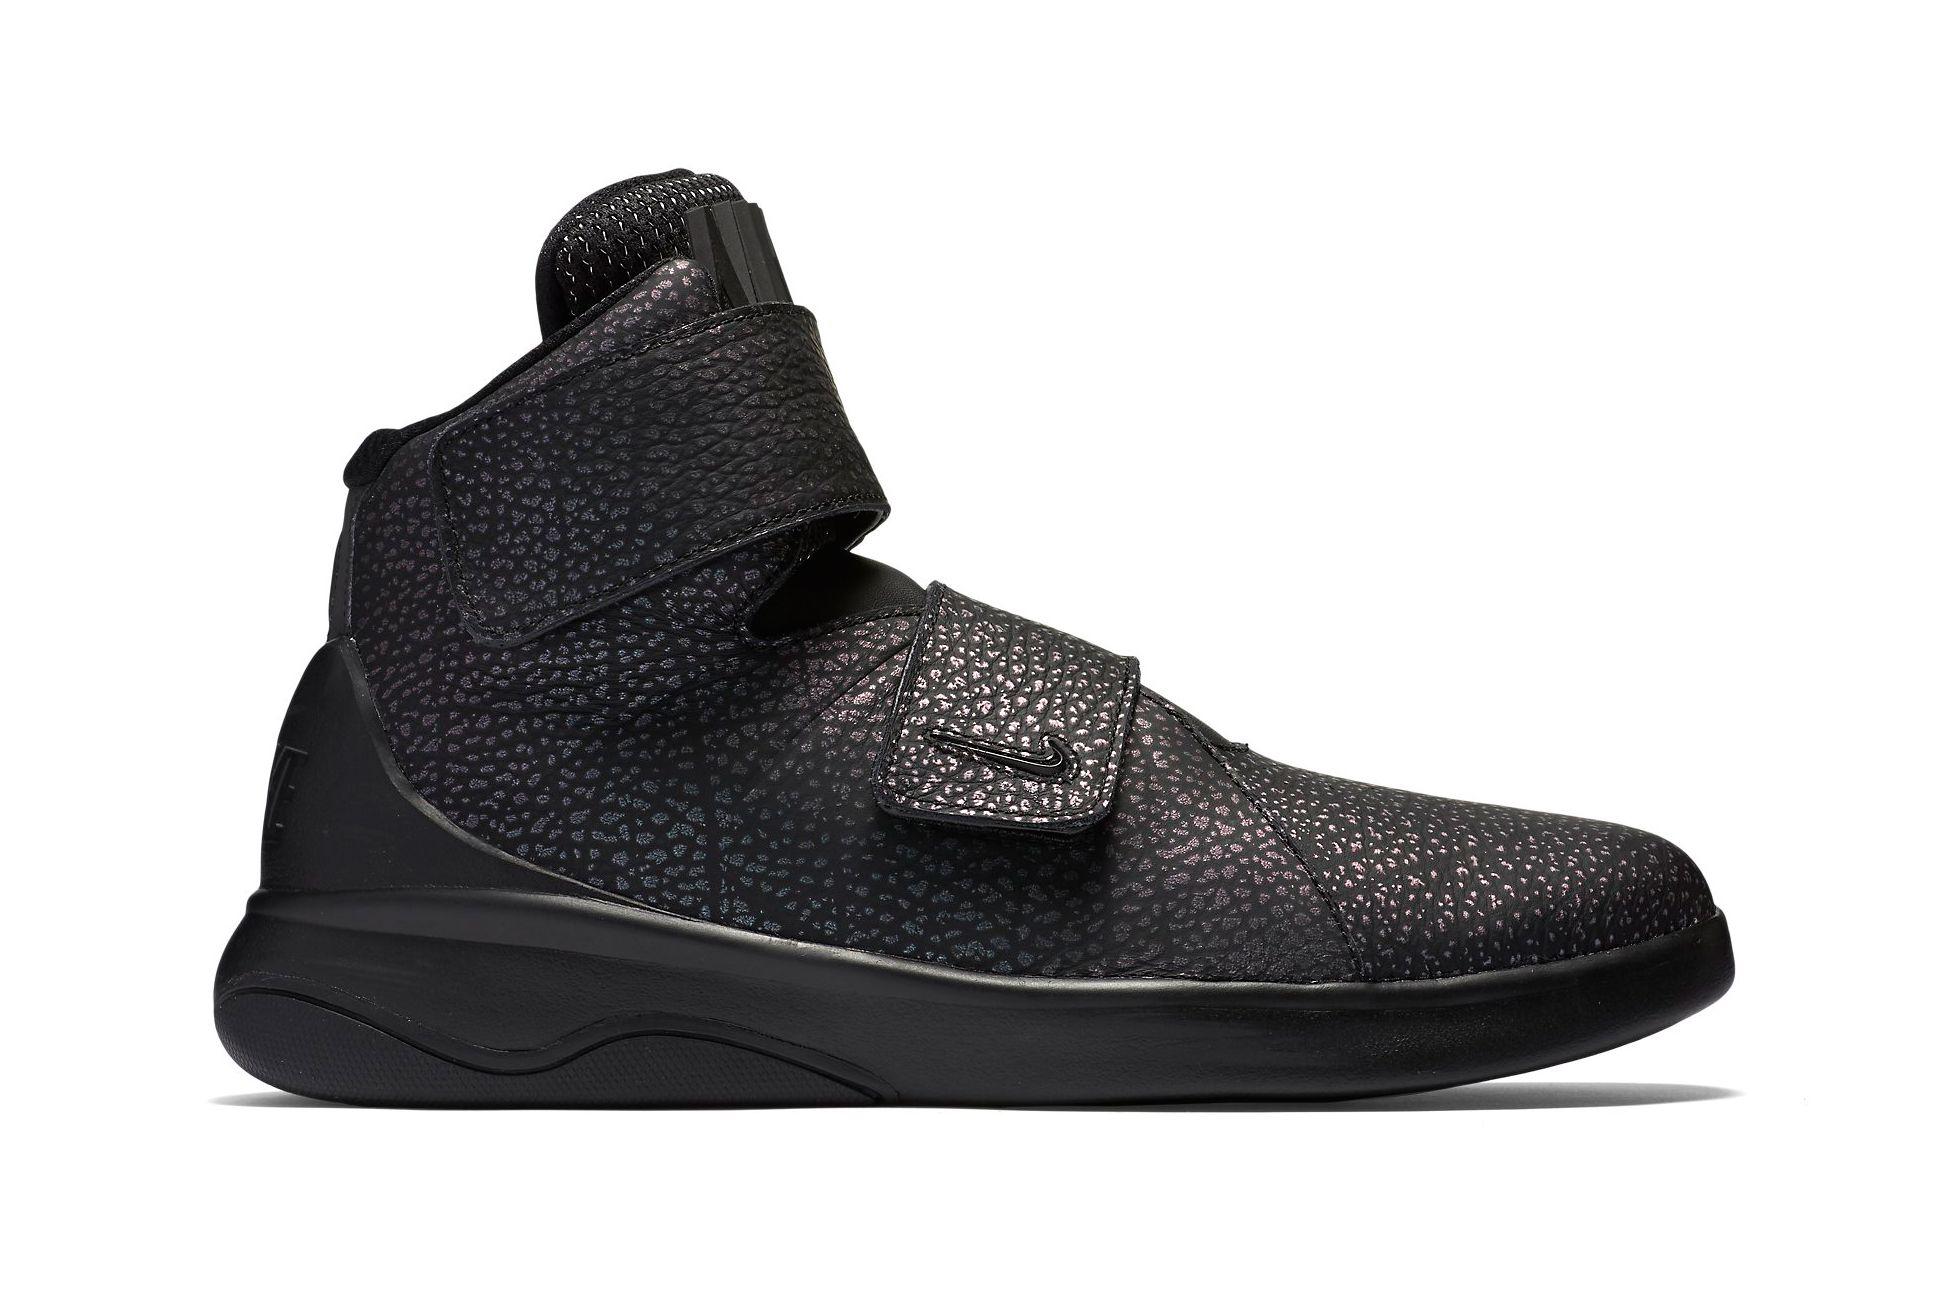 Nike Marxman Premium QS Best Choice